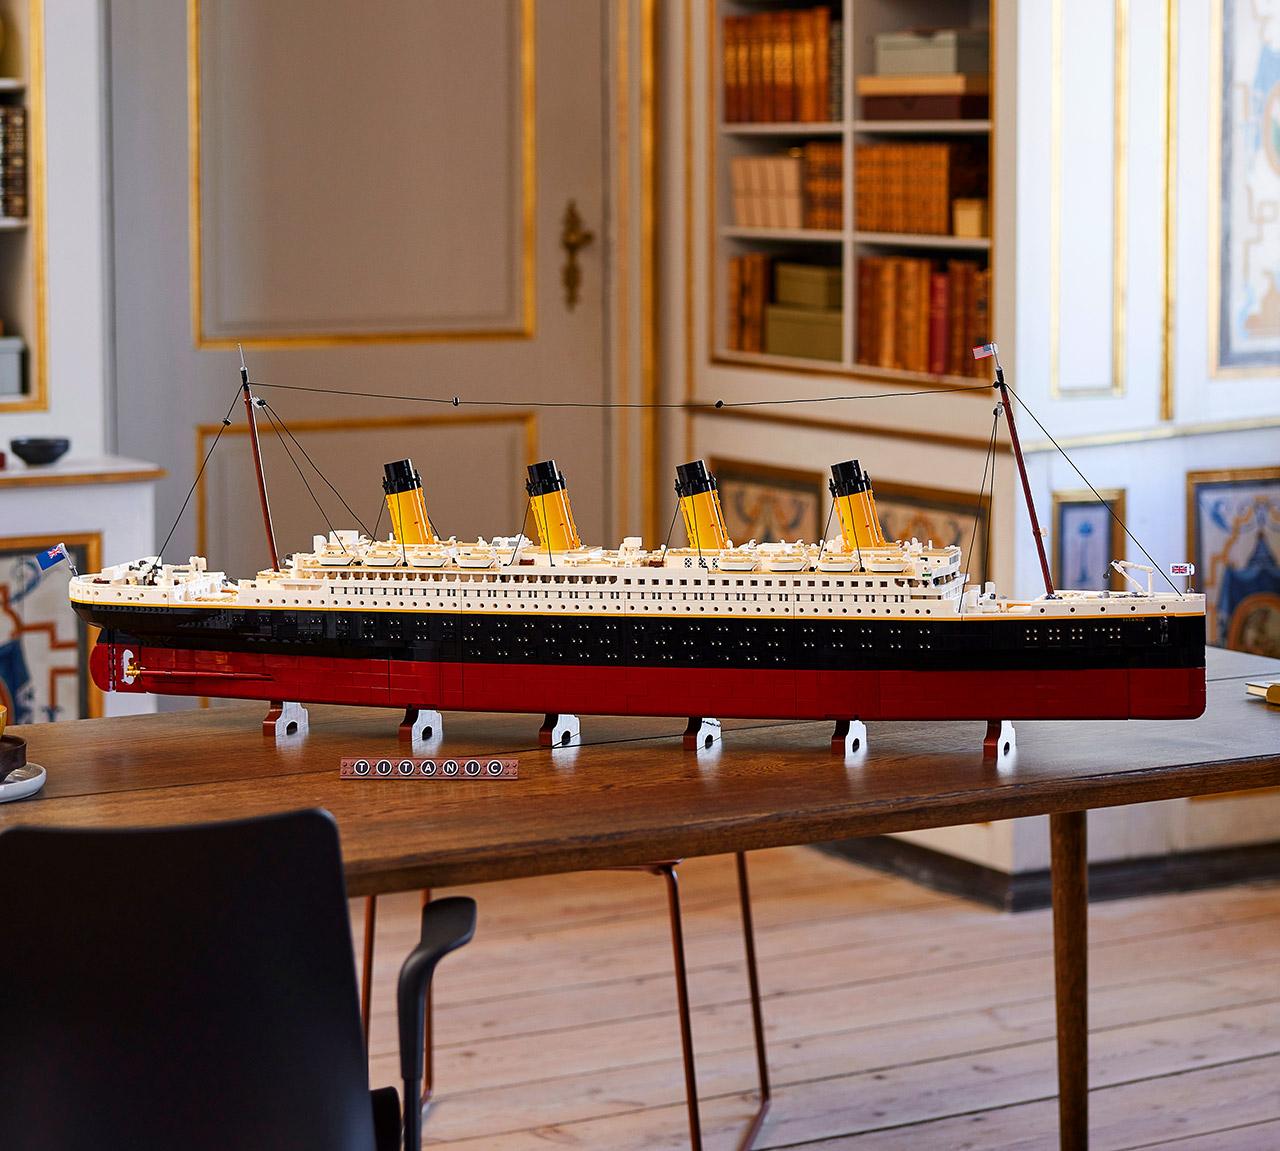 LEGO 10294 Titanic Ship Set 9090 Pieces